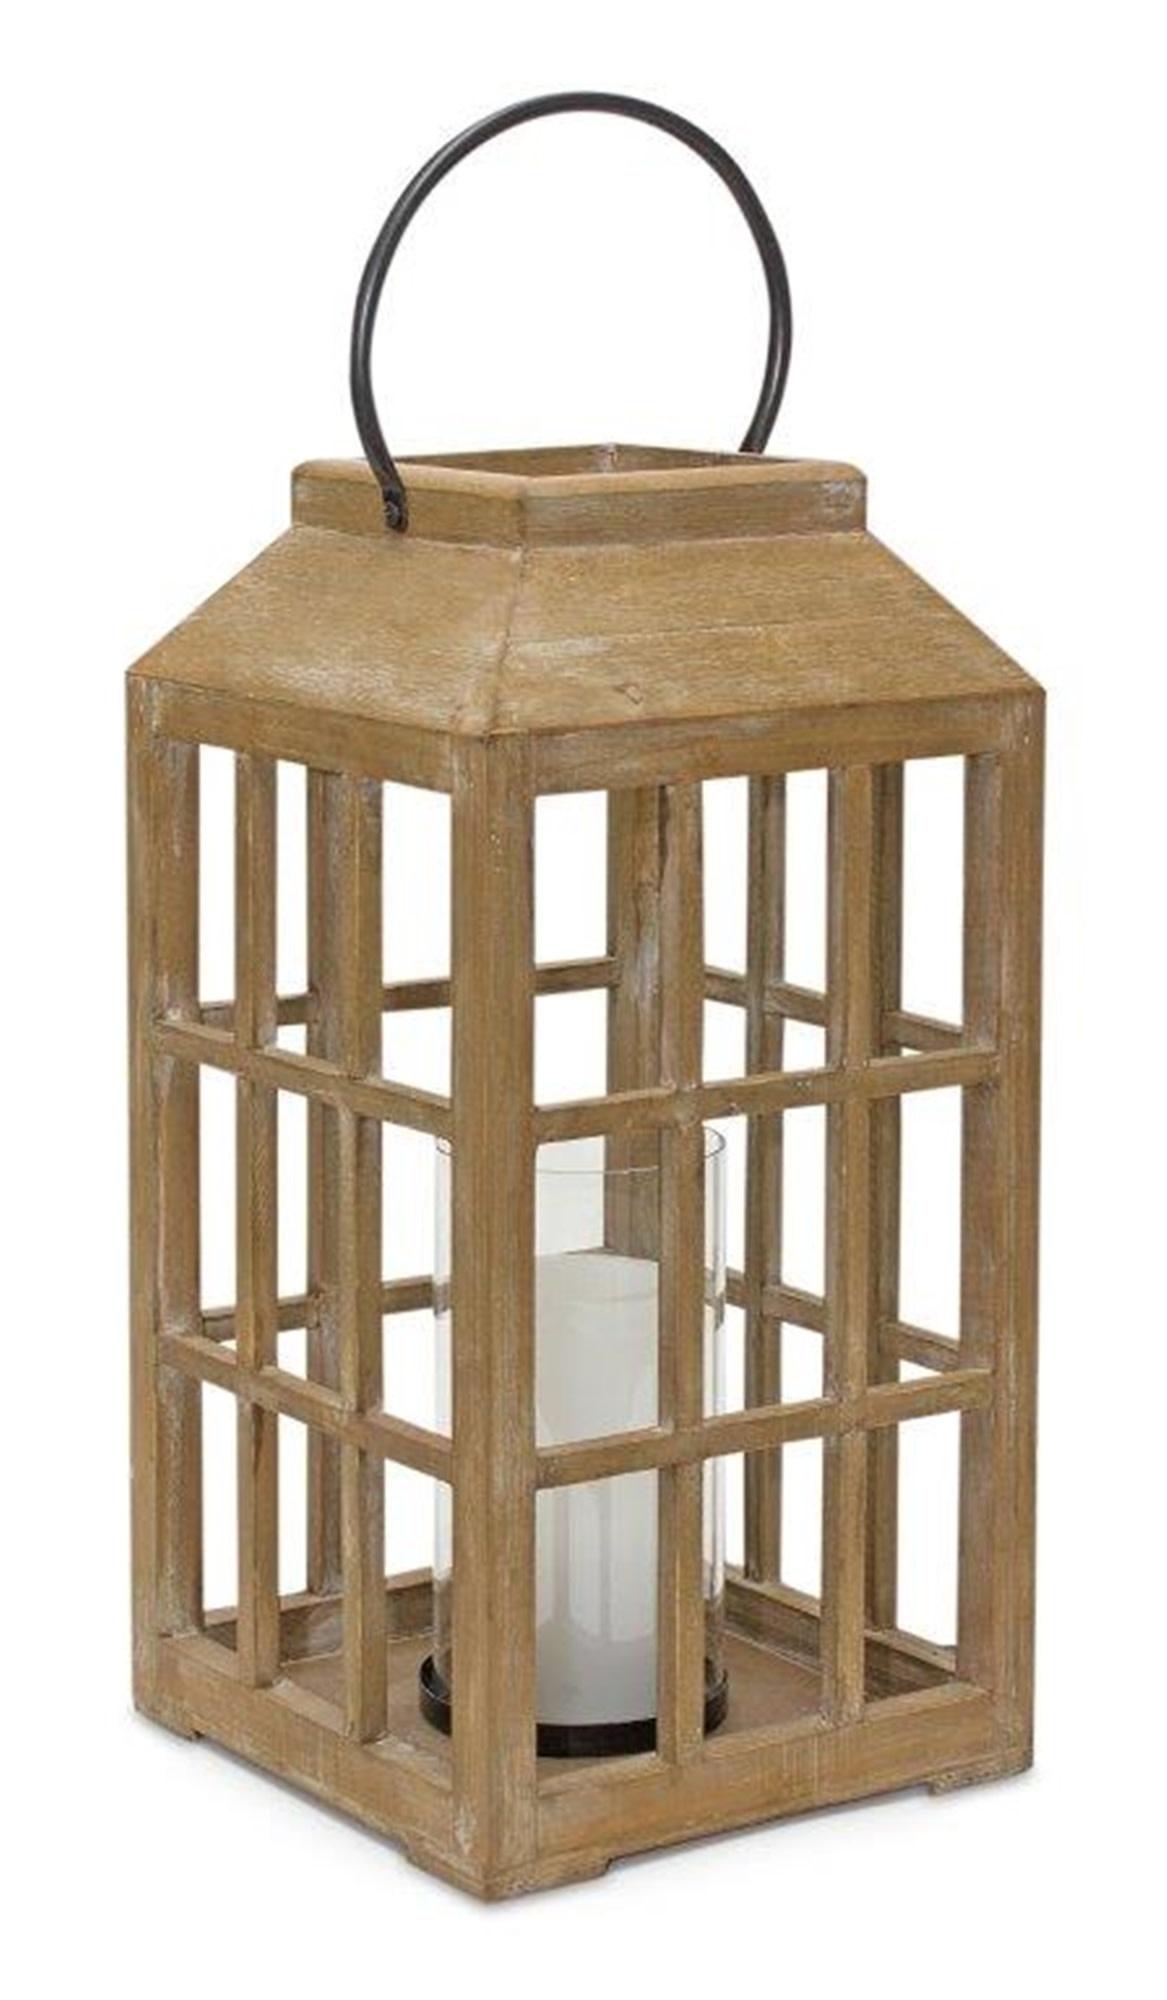 Wooden Window Pane Cylinder Lantern (2-Sizes)